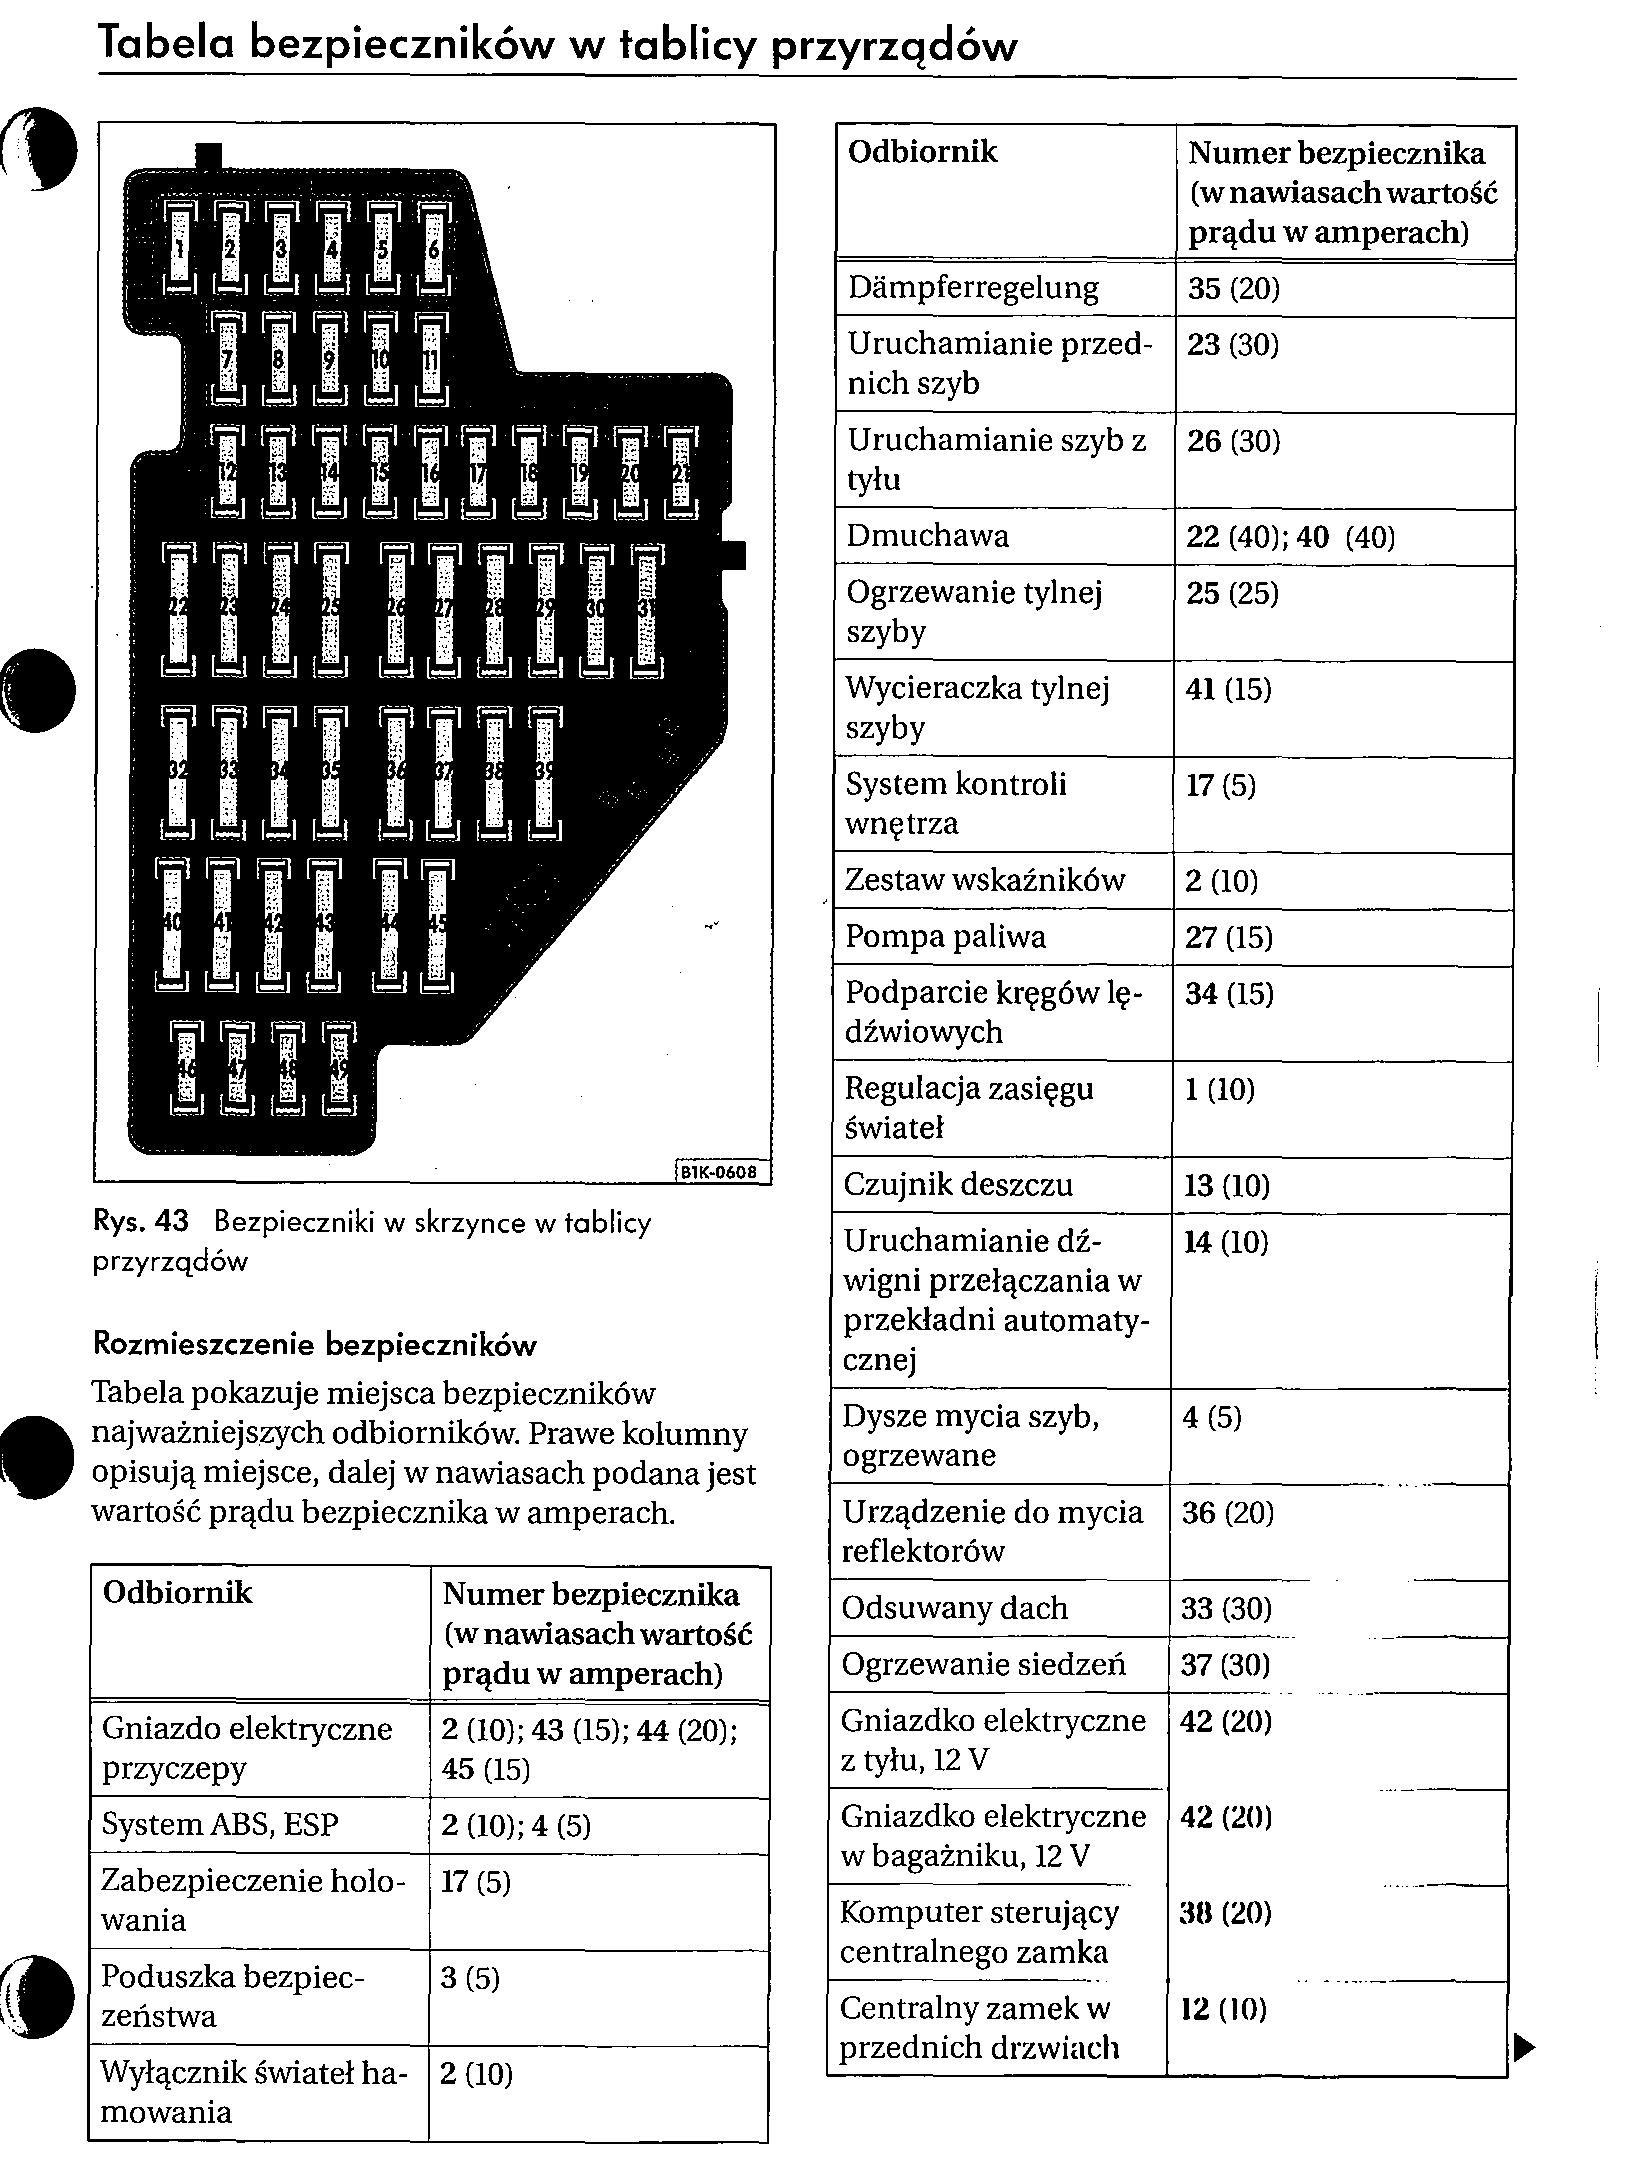 2012 Vw Passat Fuse Box Diagram : passat, diagram, Volkswagen, Passat, Diagram, Wiring, Database